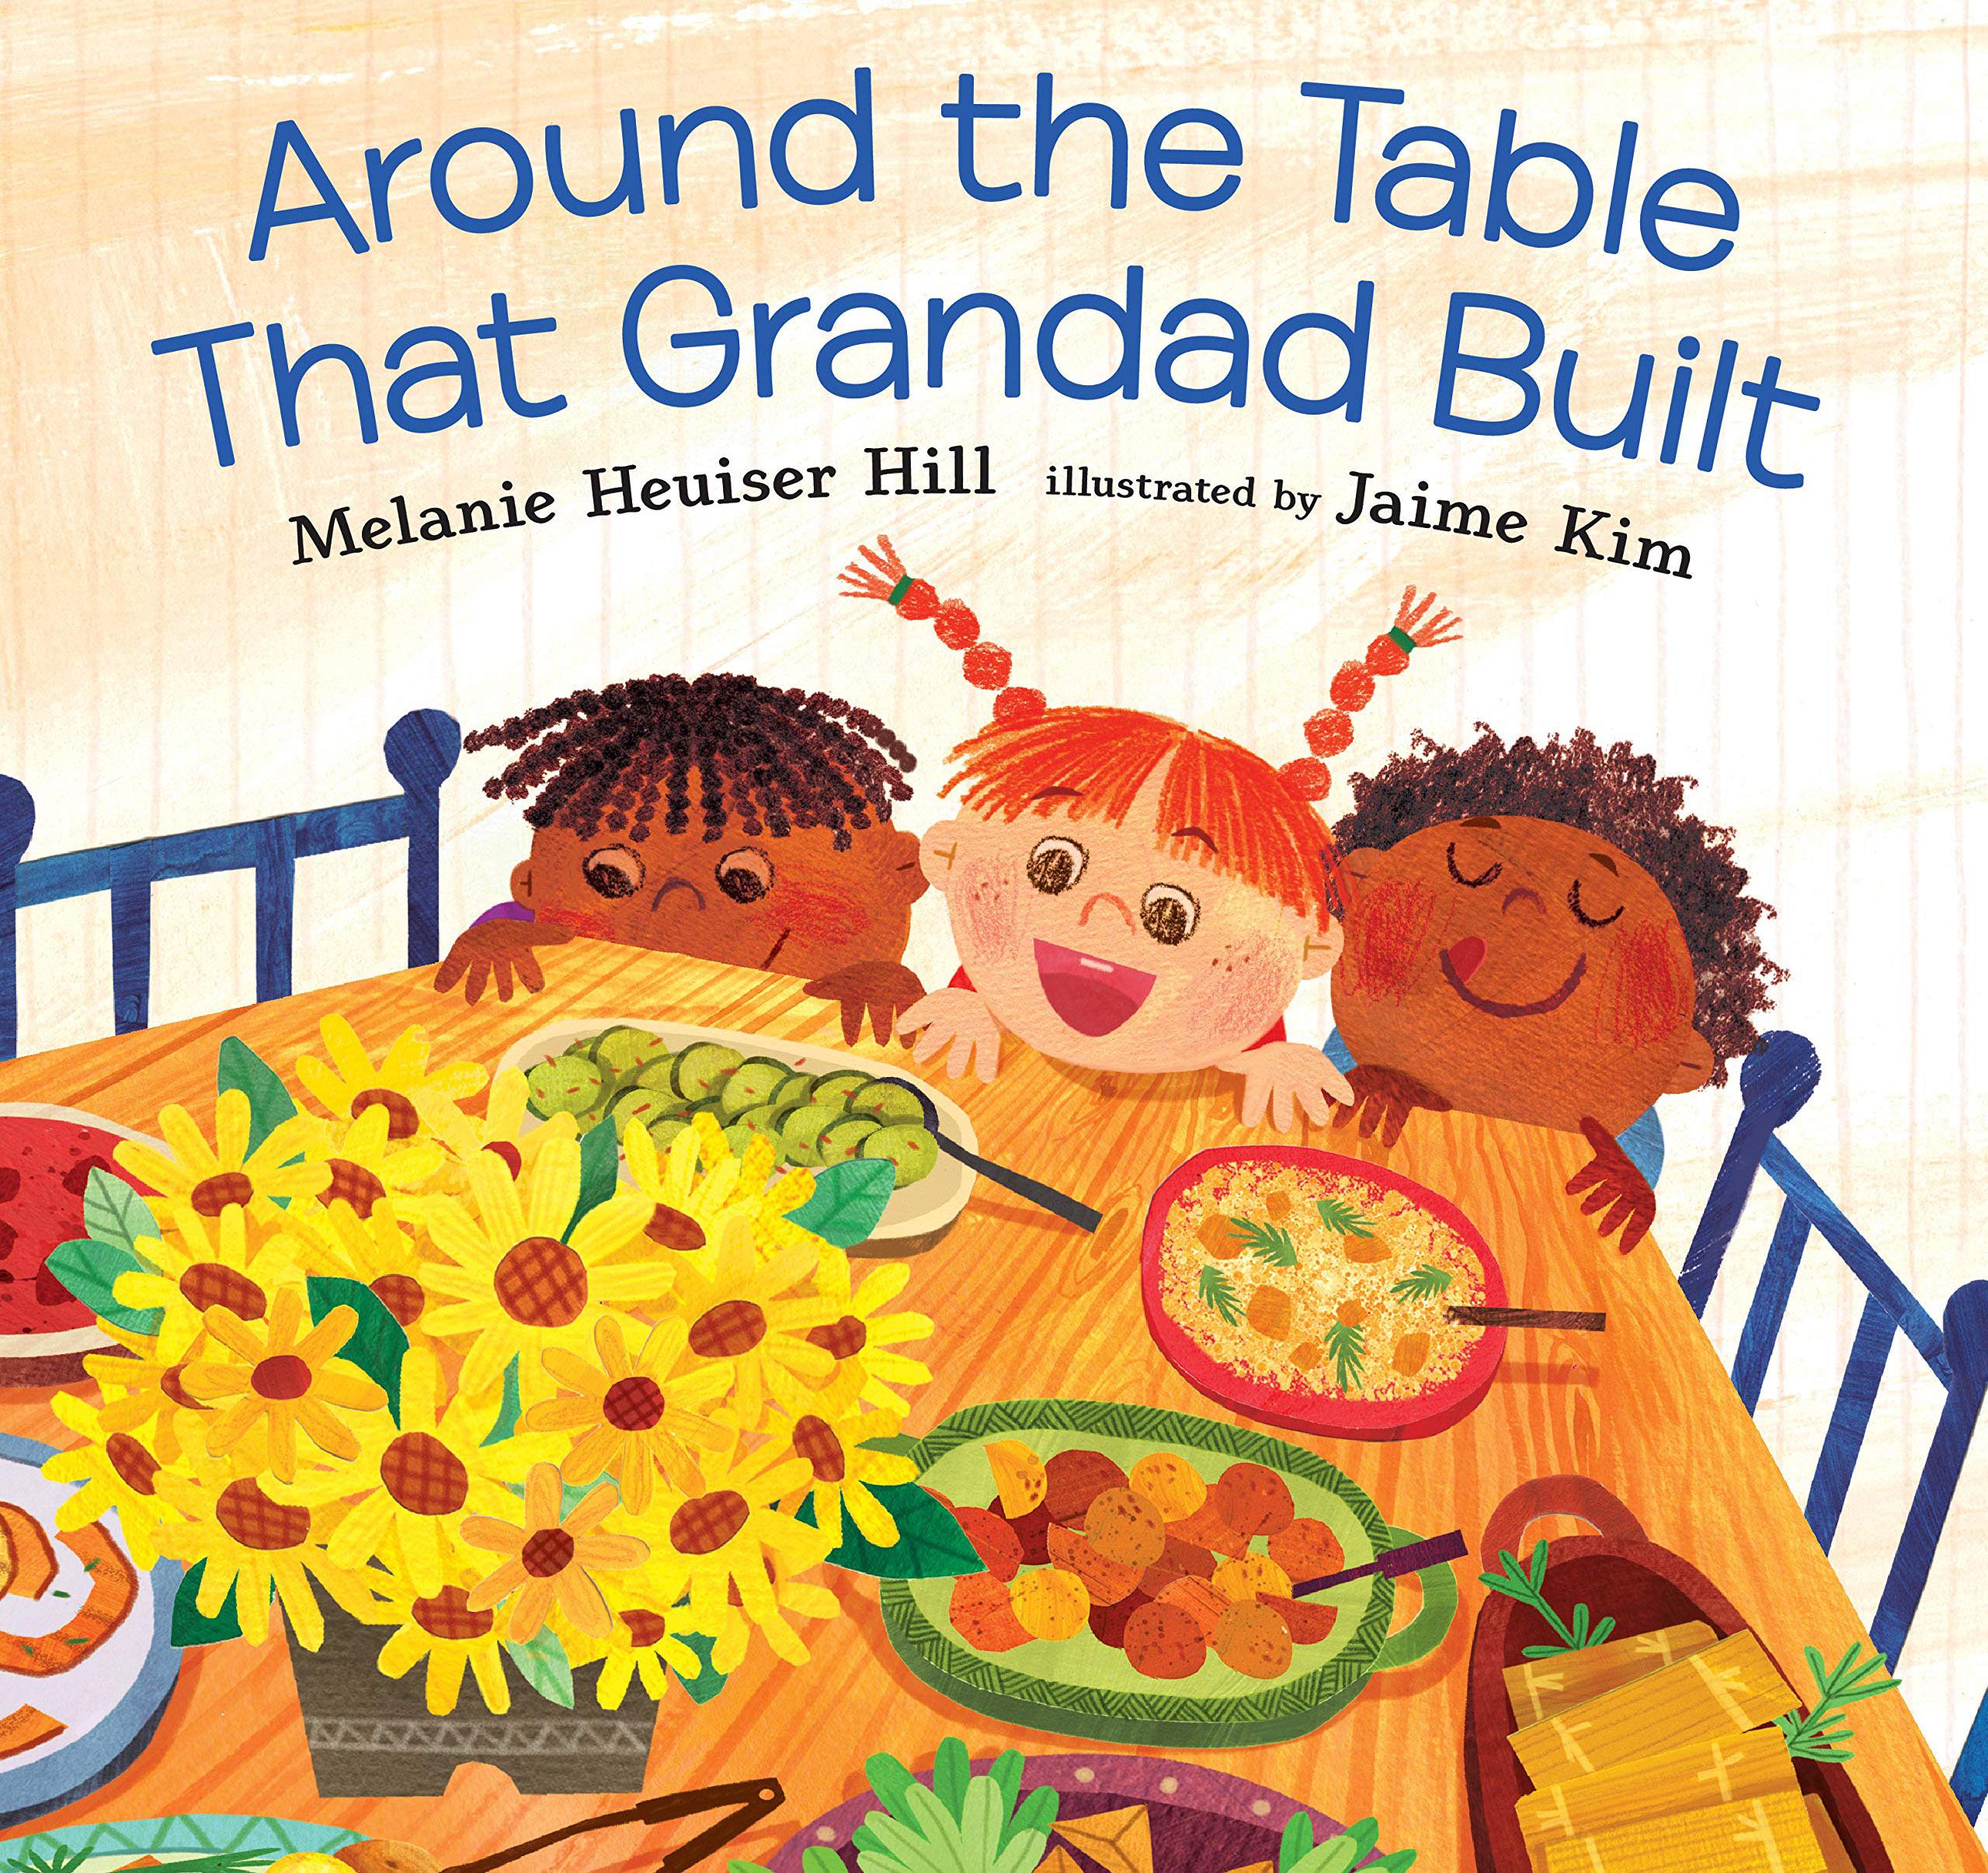 Around the Table That Grandad Built by Melanie Heuiser Hill